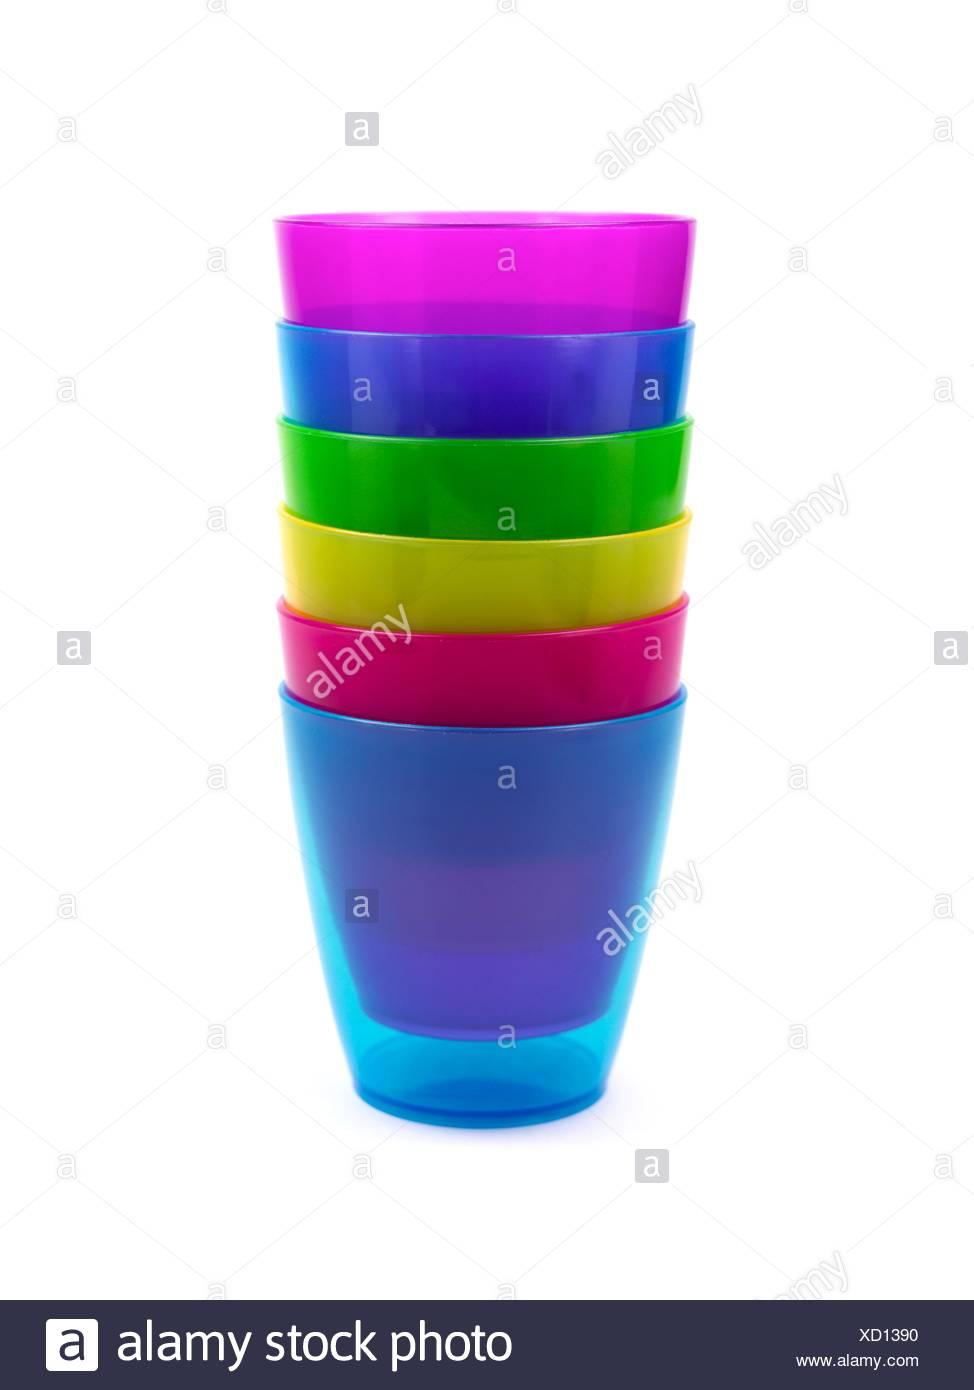 plastic drinking cups stock photo 283380972 alamy